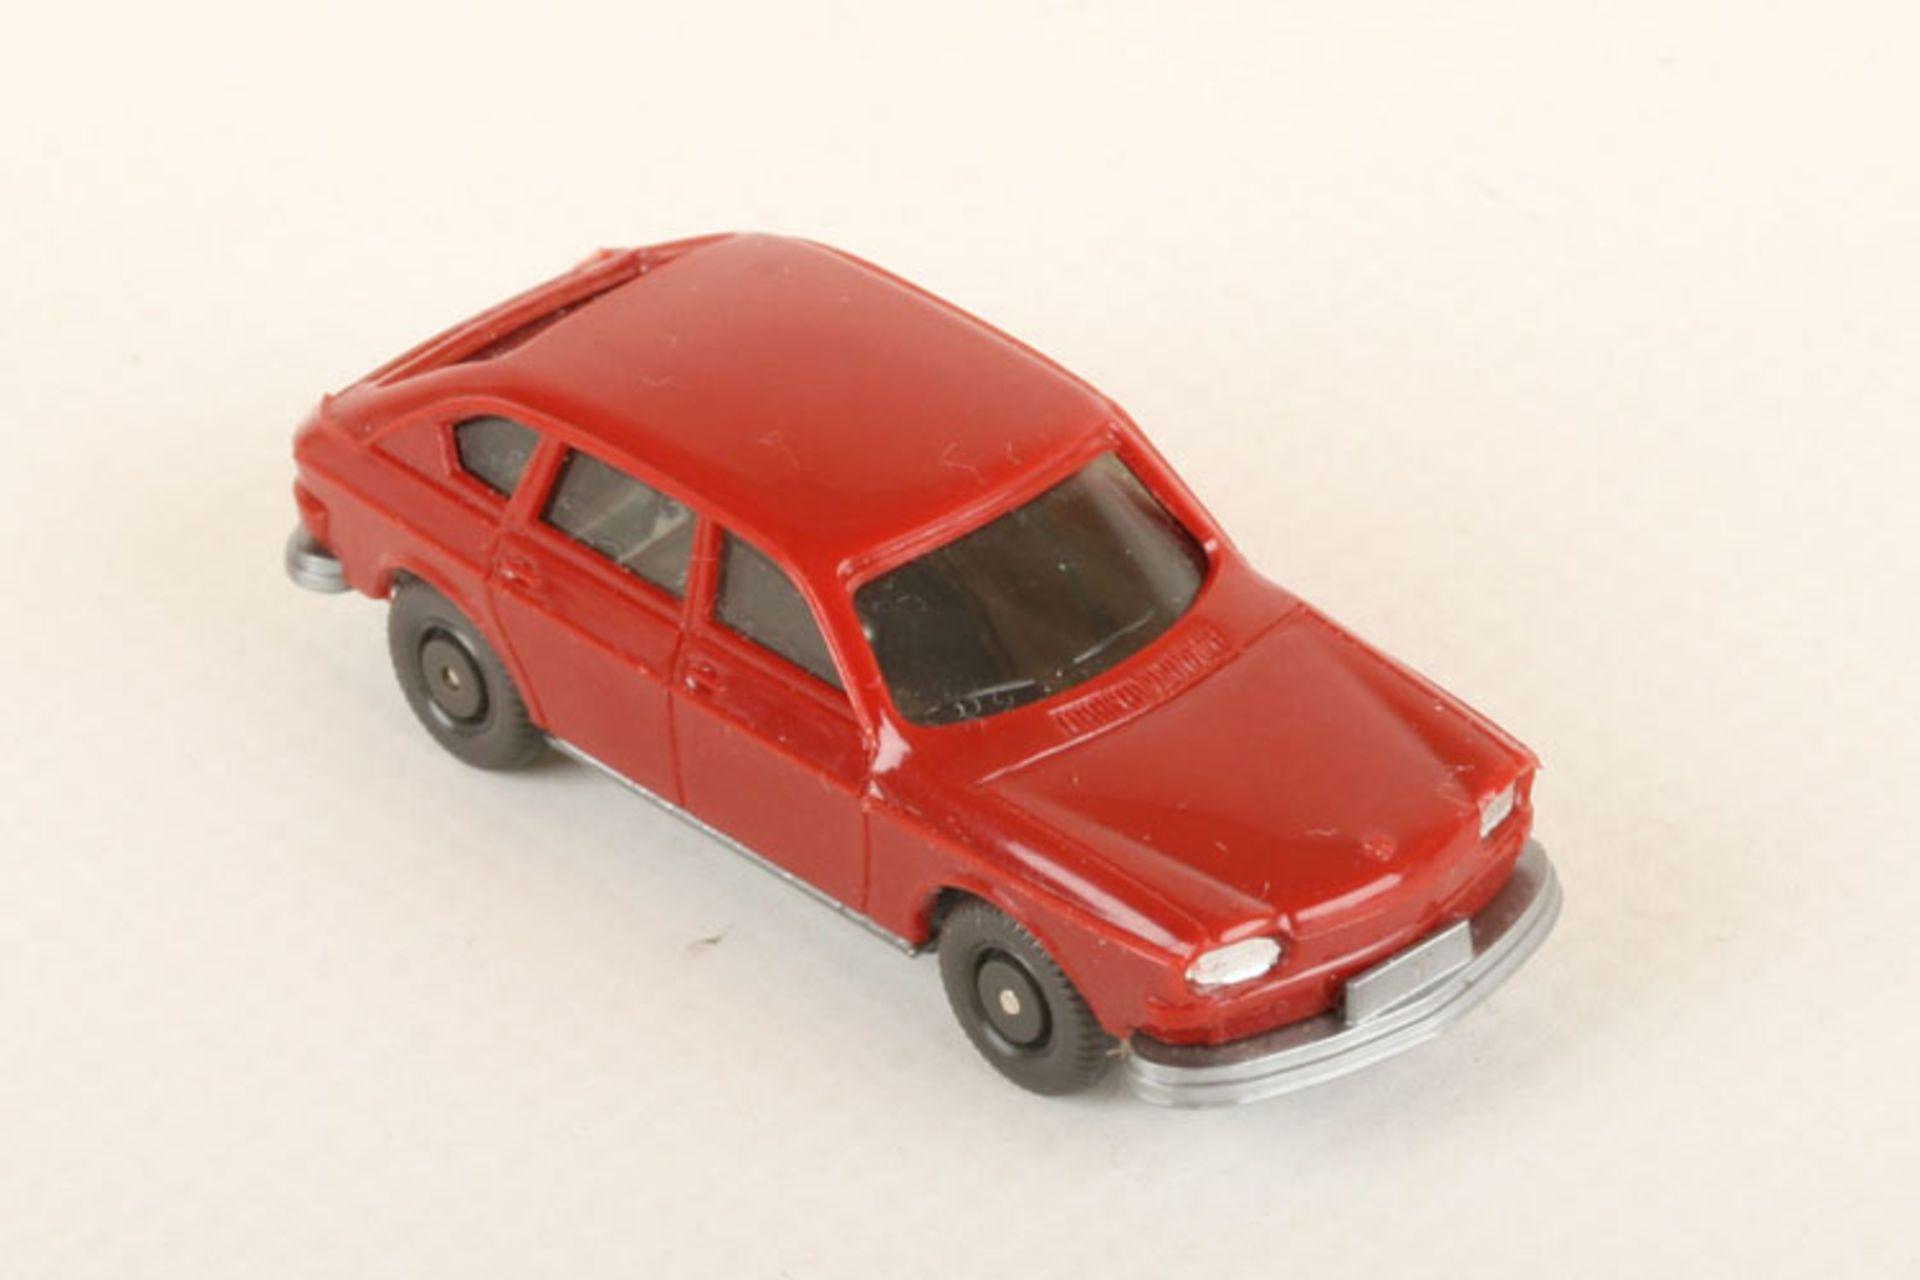 Los 1042 - Wiking VW 411 h'braunrot 46/1b, neuwertig